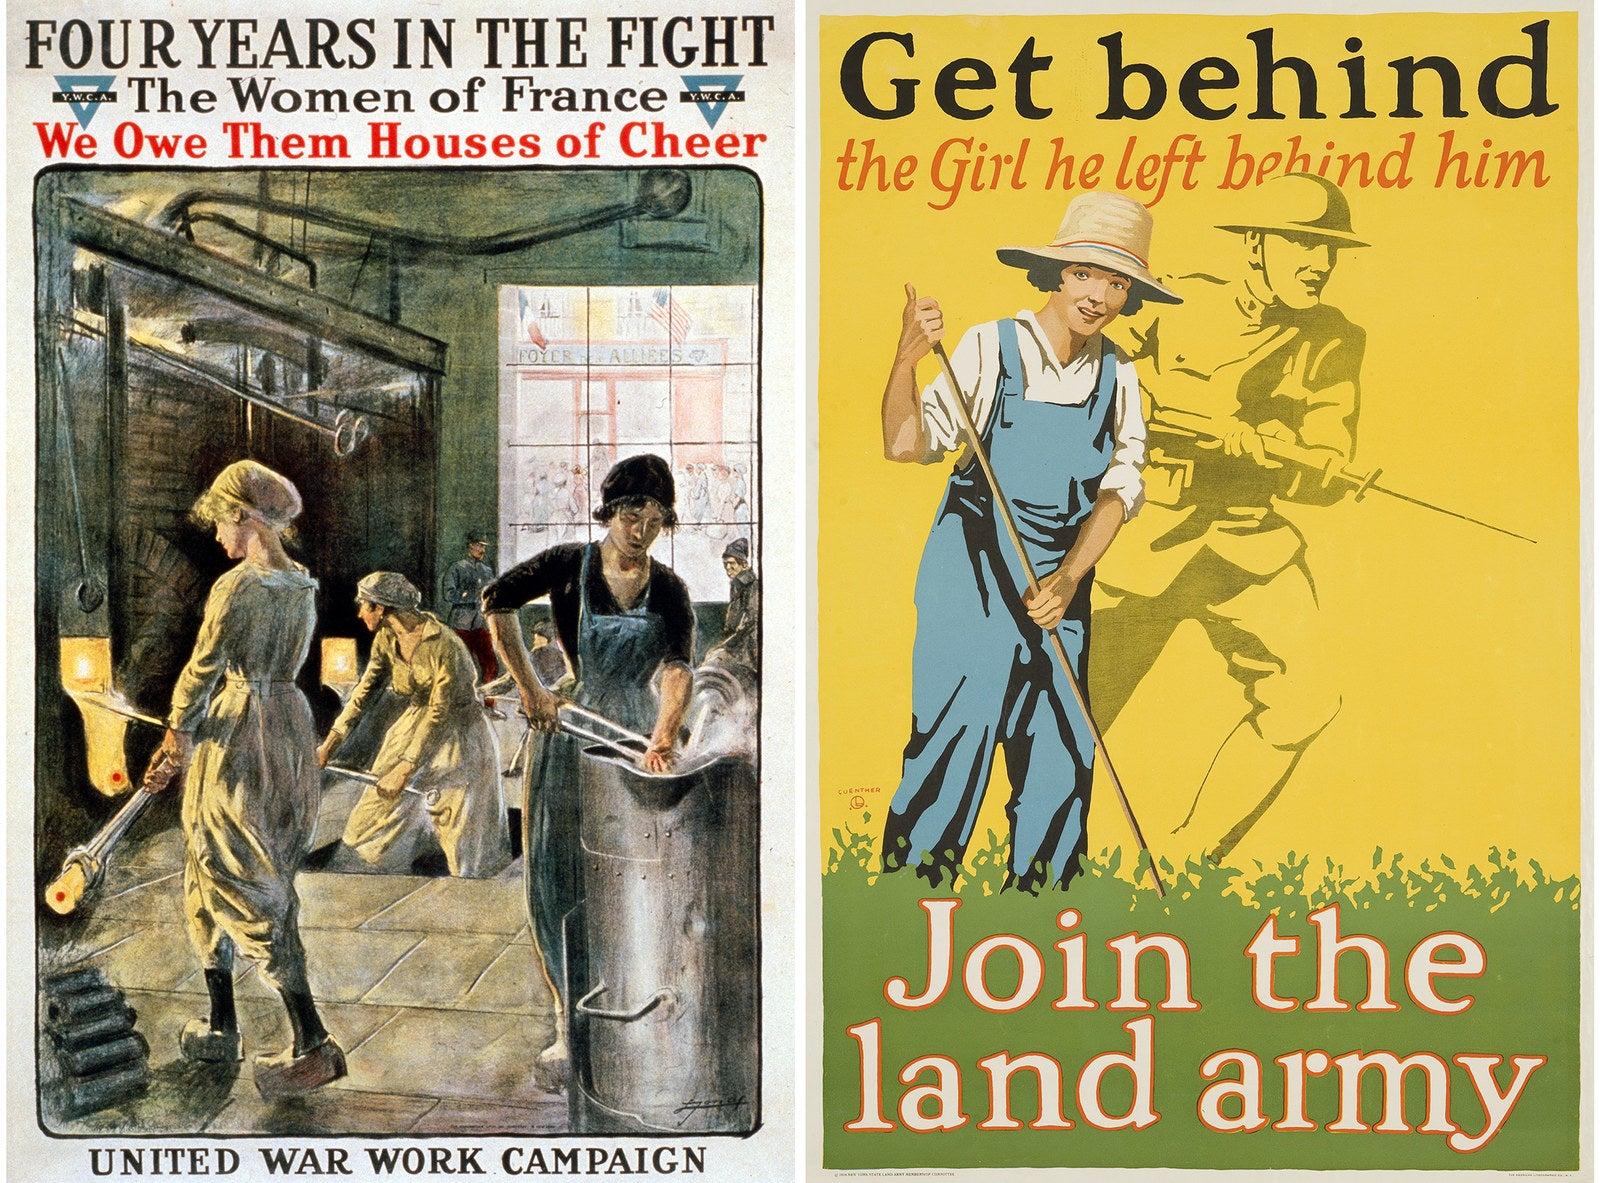 Posters encouraging women to join in the war effort, 1918.